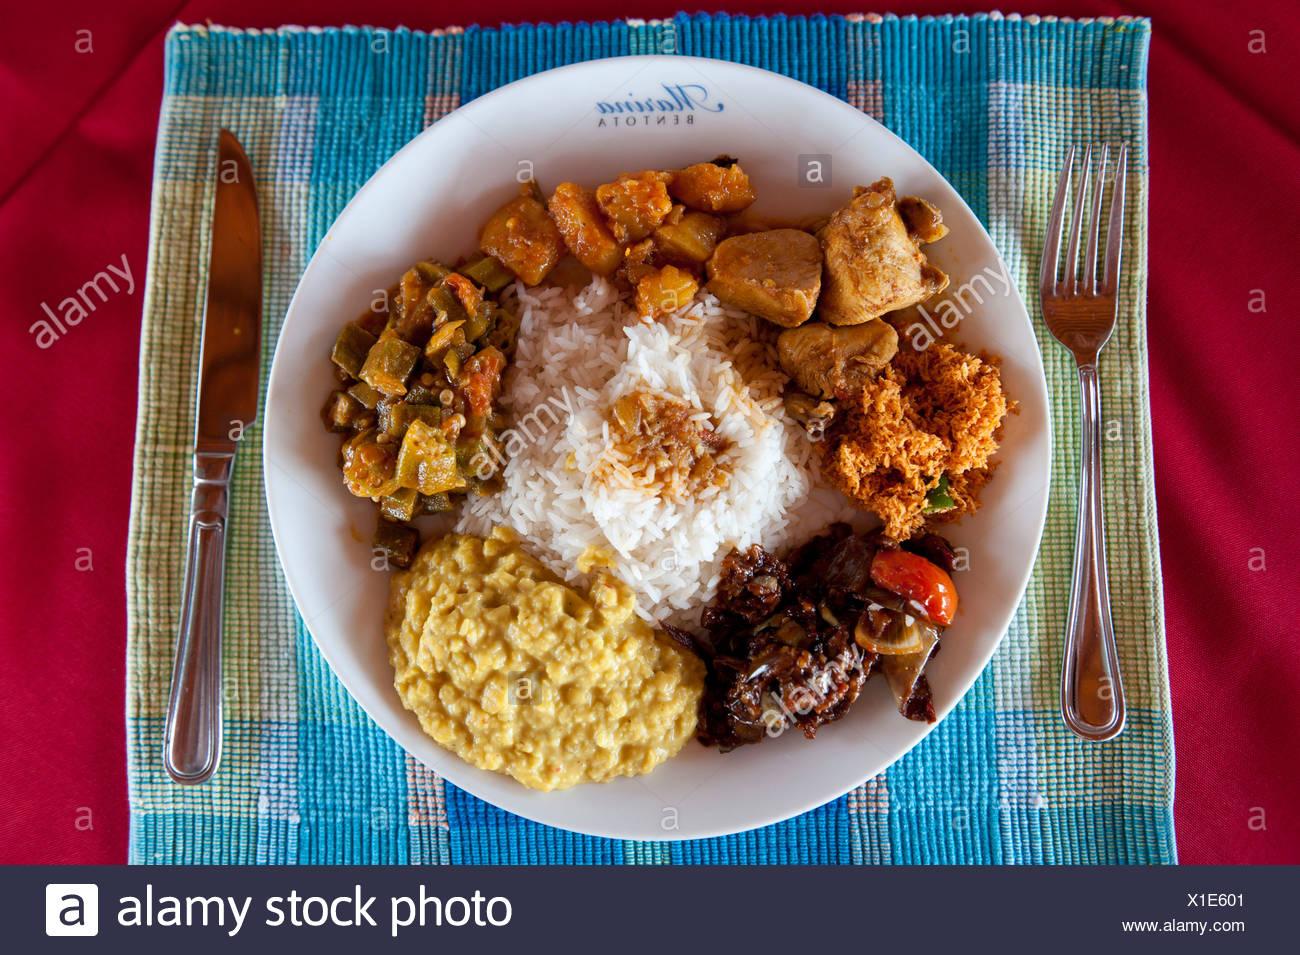 Sri lankan food stock photos sri lankan food stock images alamy singhala sinhala or sinhalese curry served with rice bentota sri lanka forumfinder Choice Image